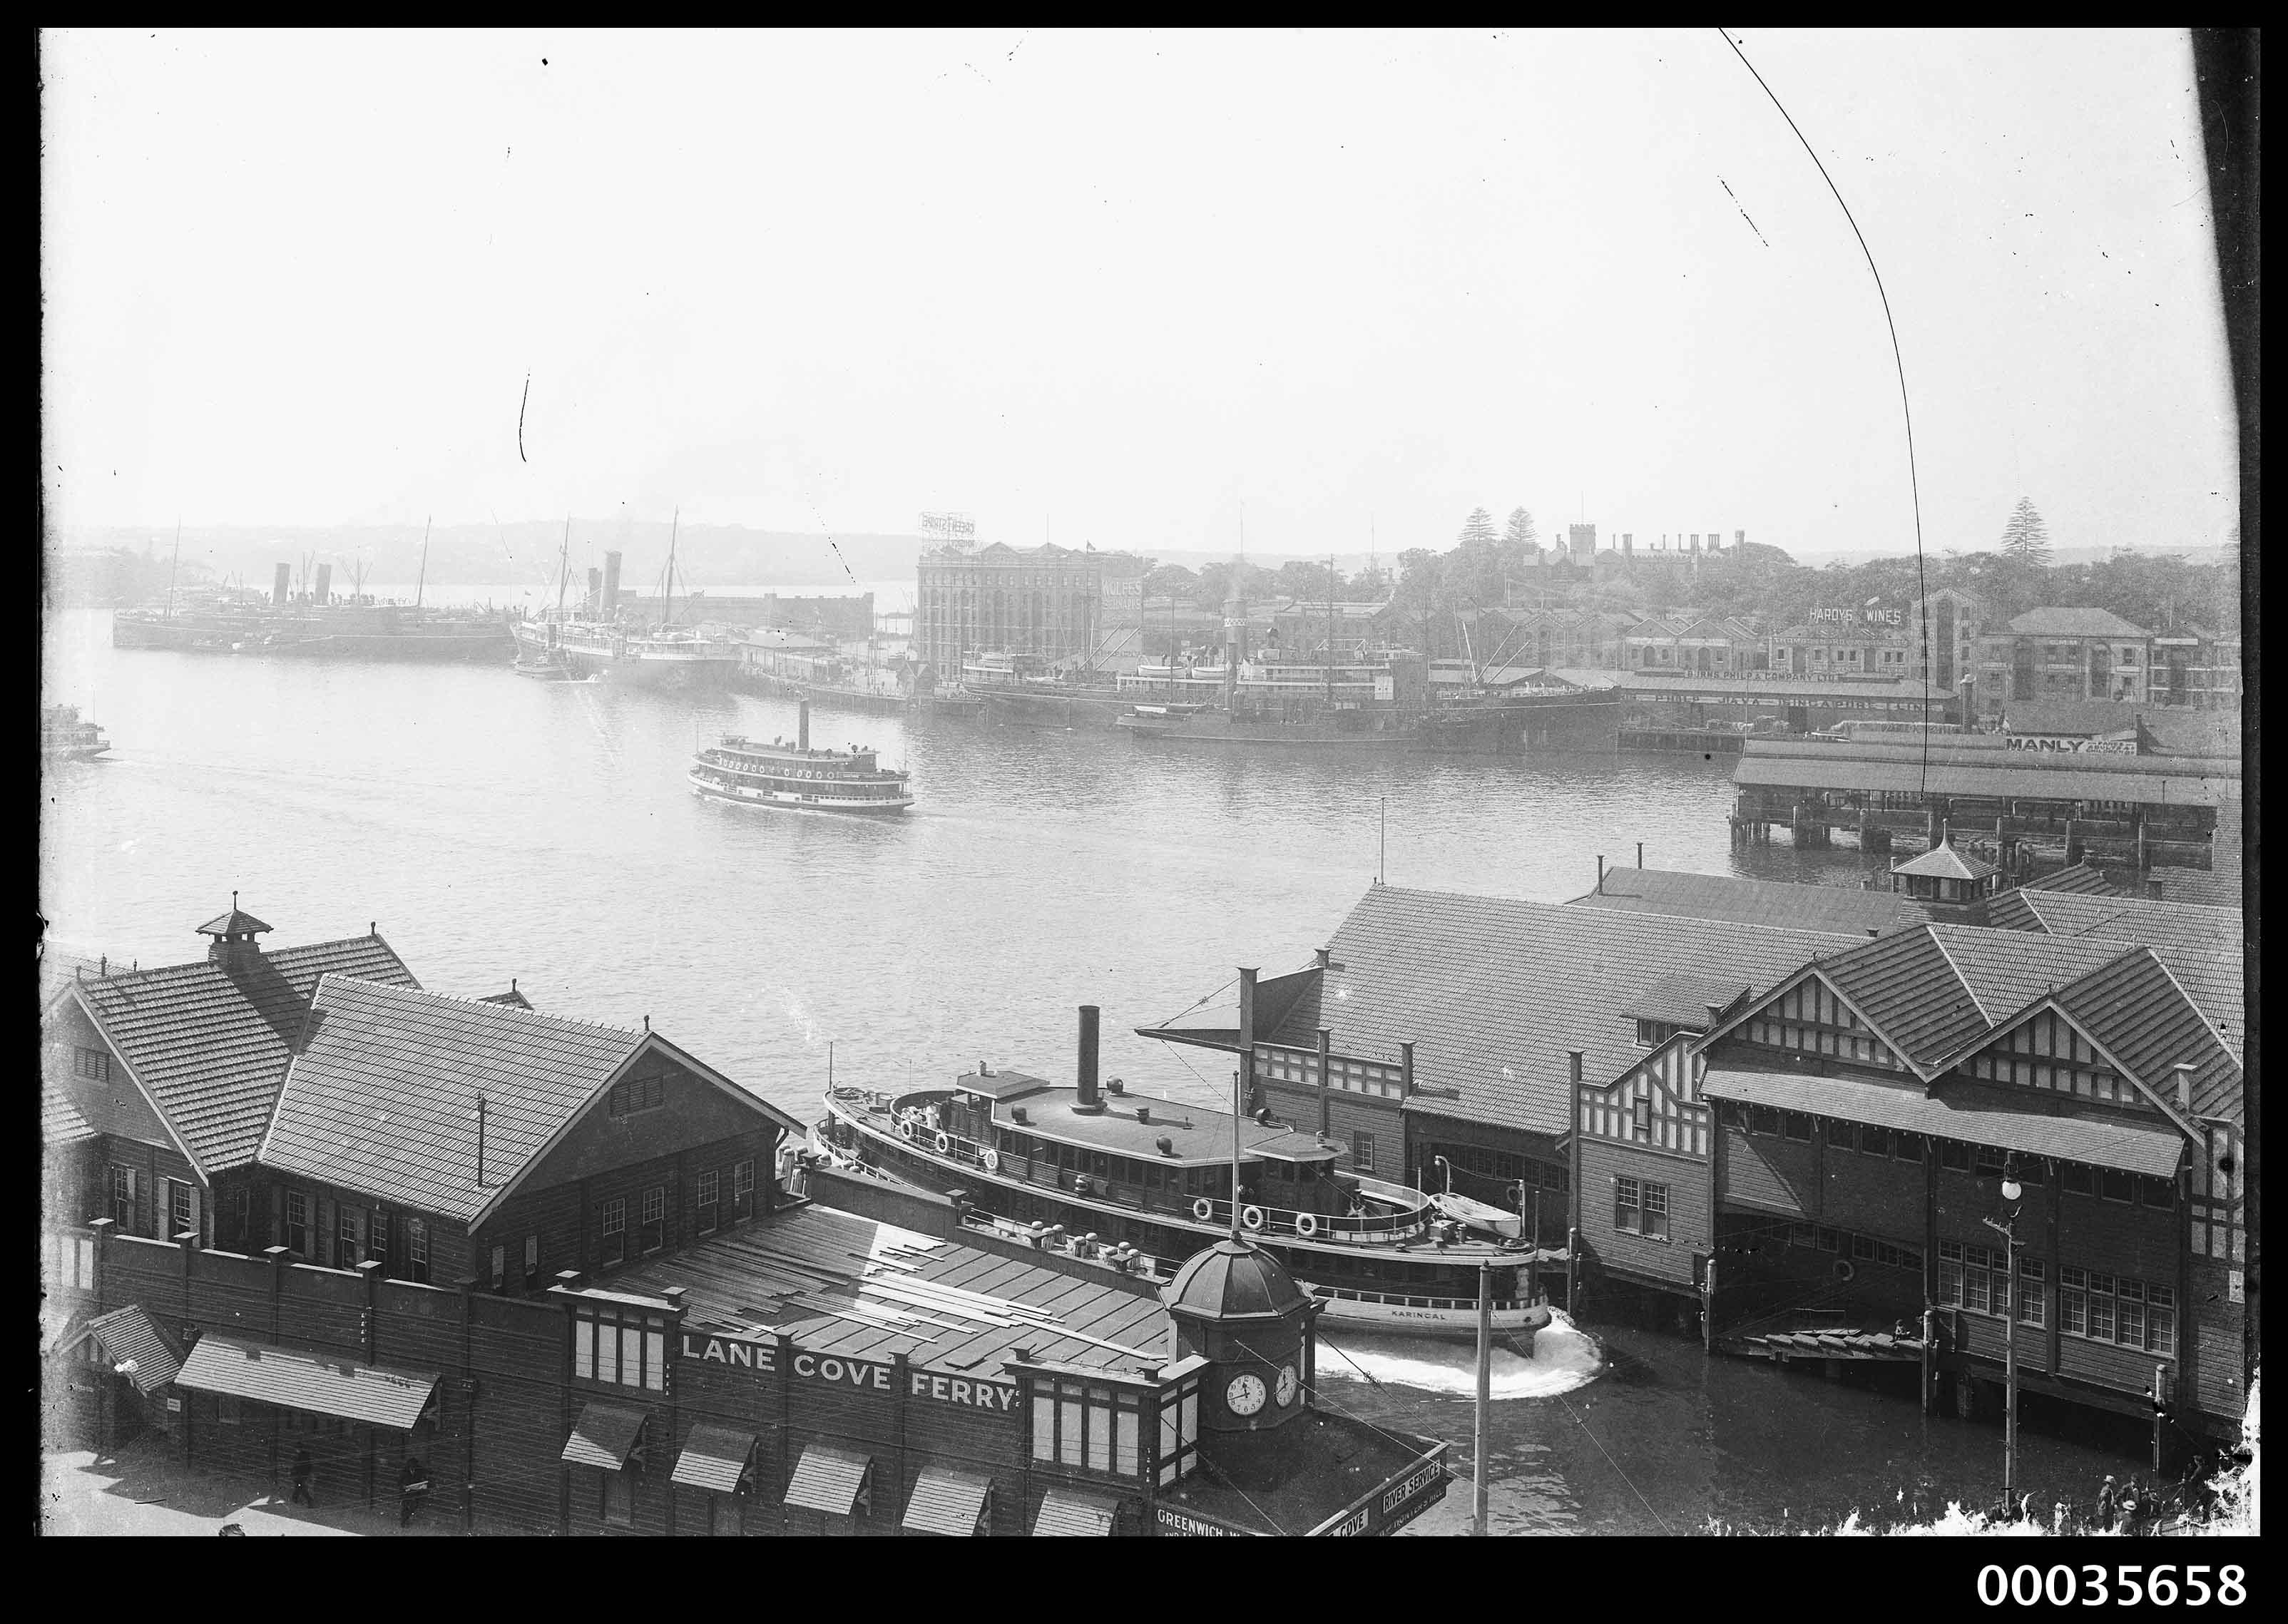 SS KARINGAL at ferry wharf in Circular Quay, Sydney, 1901-1953